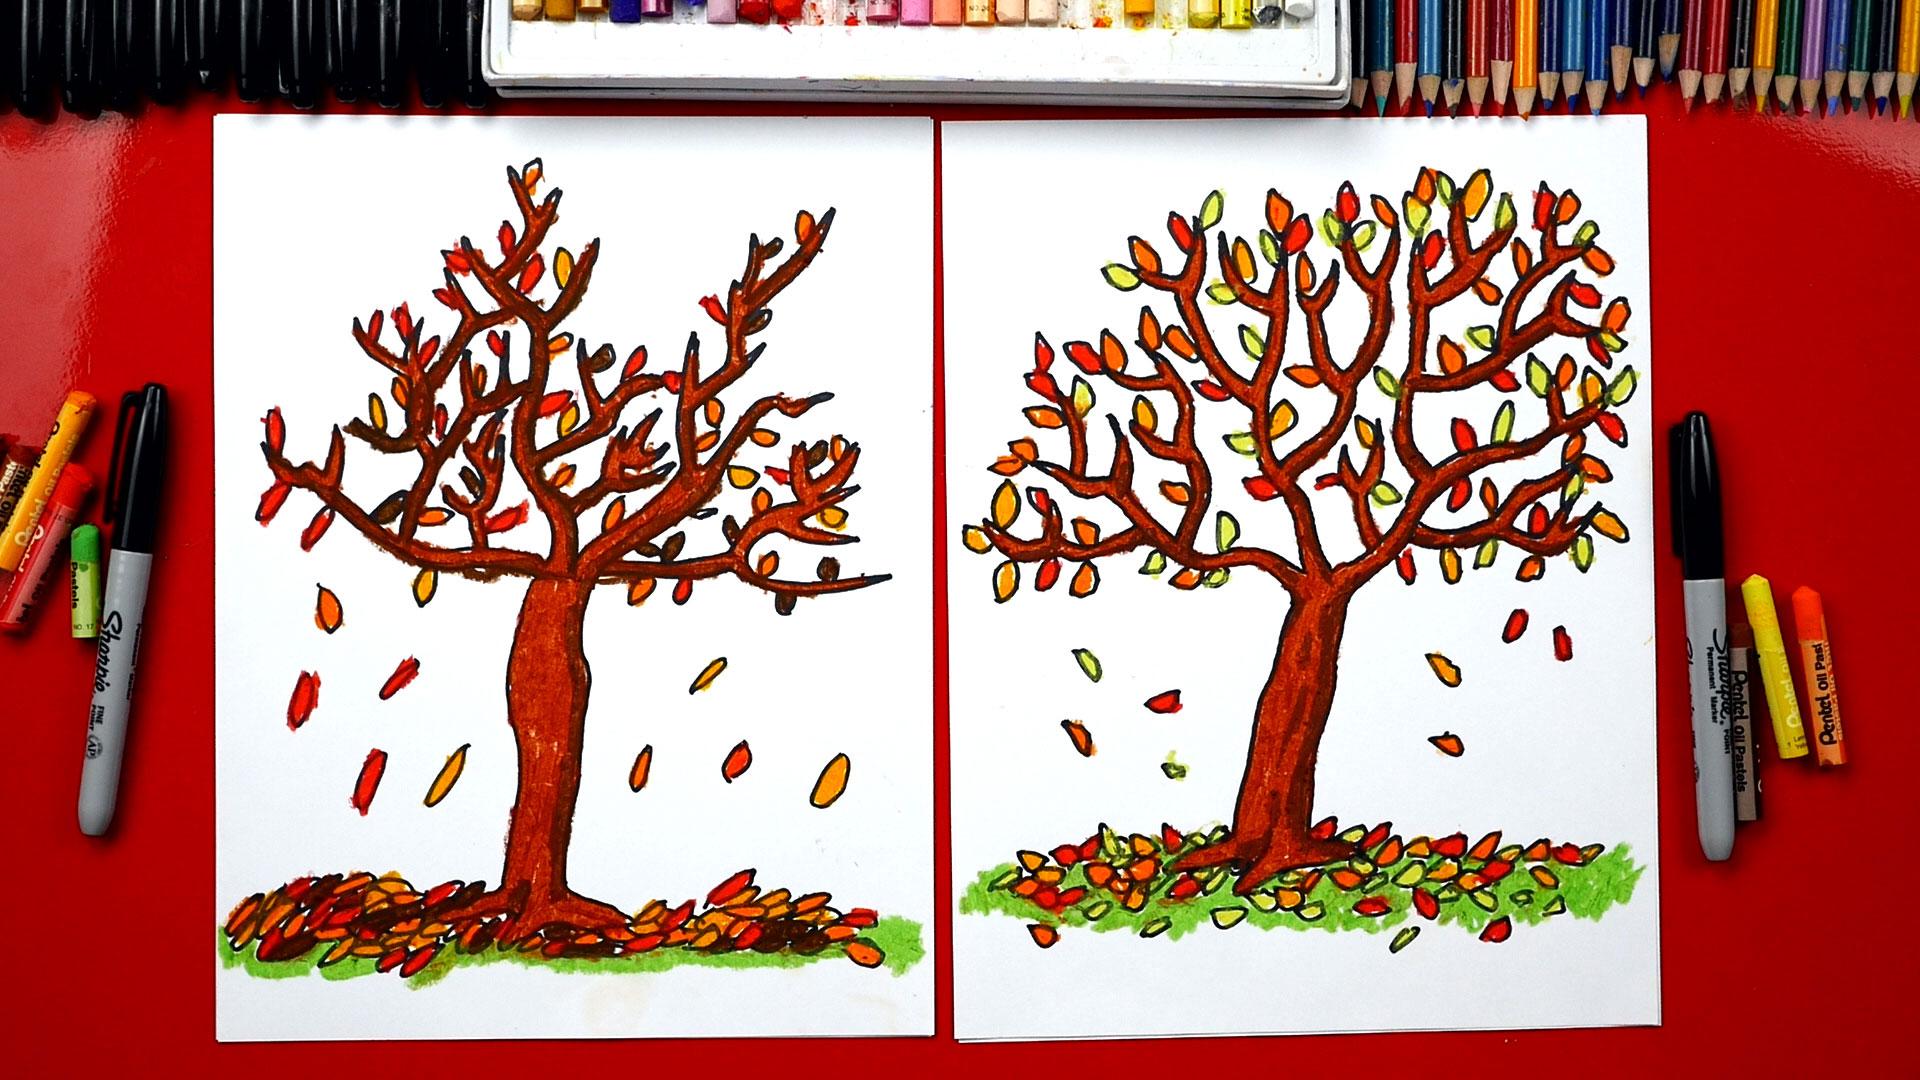 The editors of publications international, ltd. How To Draw A Fall Tree - Art For Kids Hub